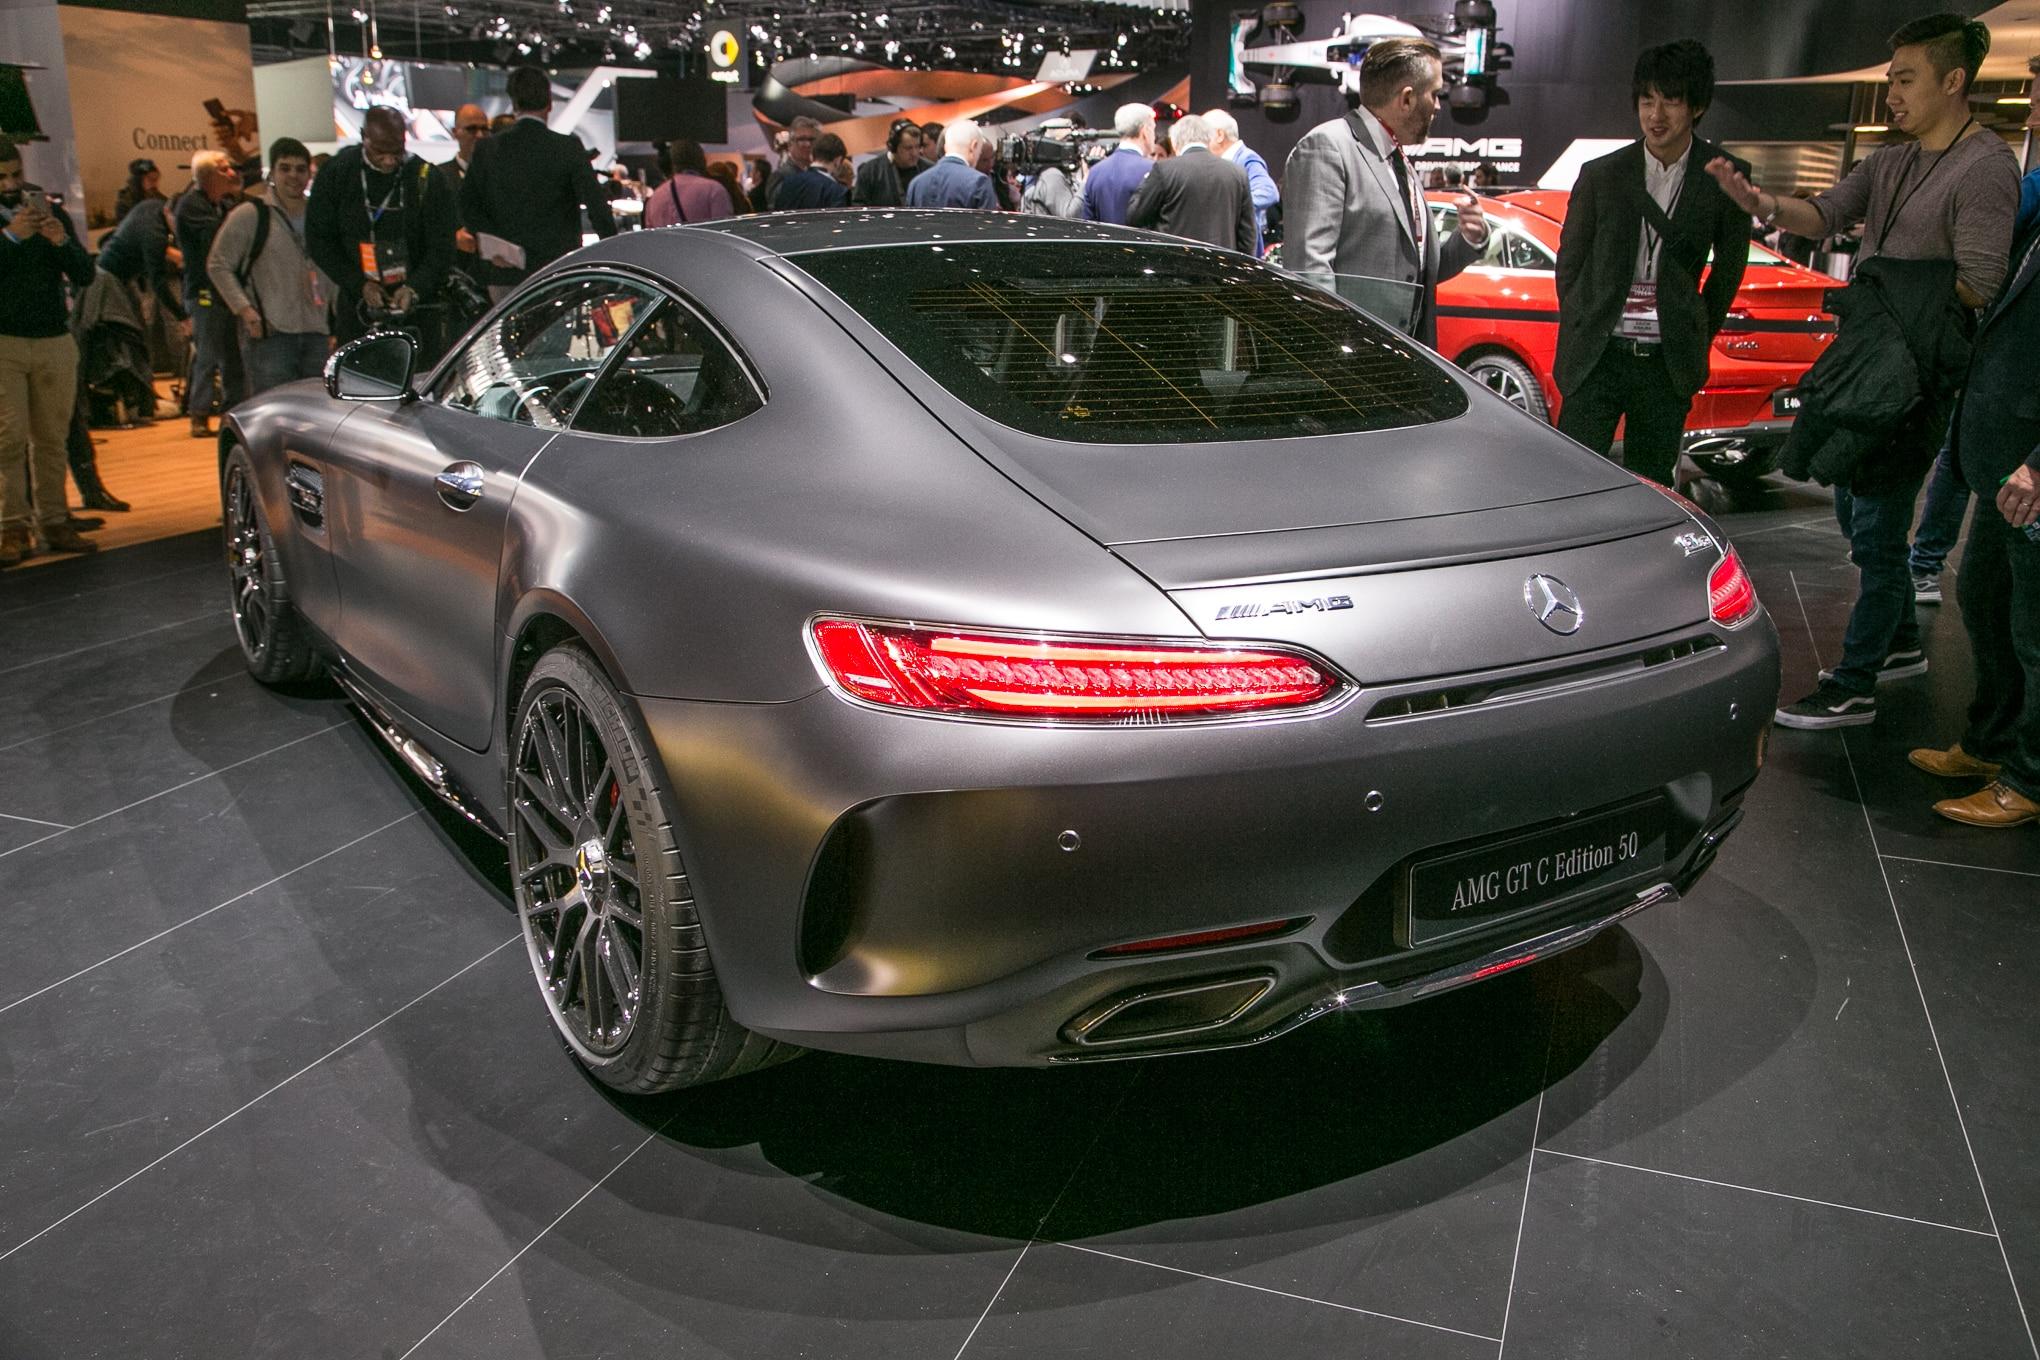 http://st.automobilemag.com/uploads/sites/11/2017/01/2018-Mercedes-AMG-GT-C-Coupe-Edition-50-rear-three-quarter-02.jpg